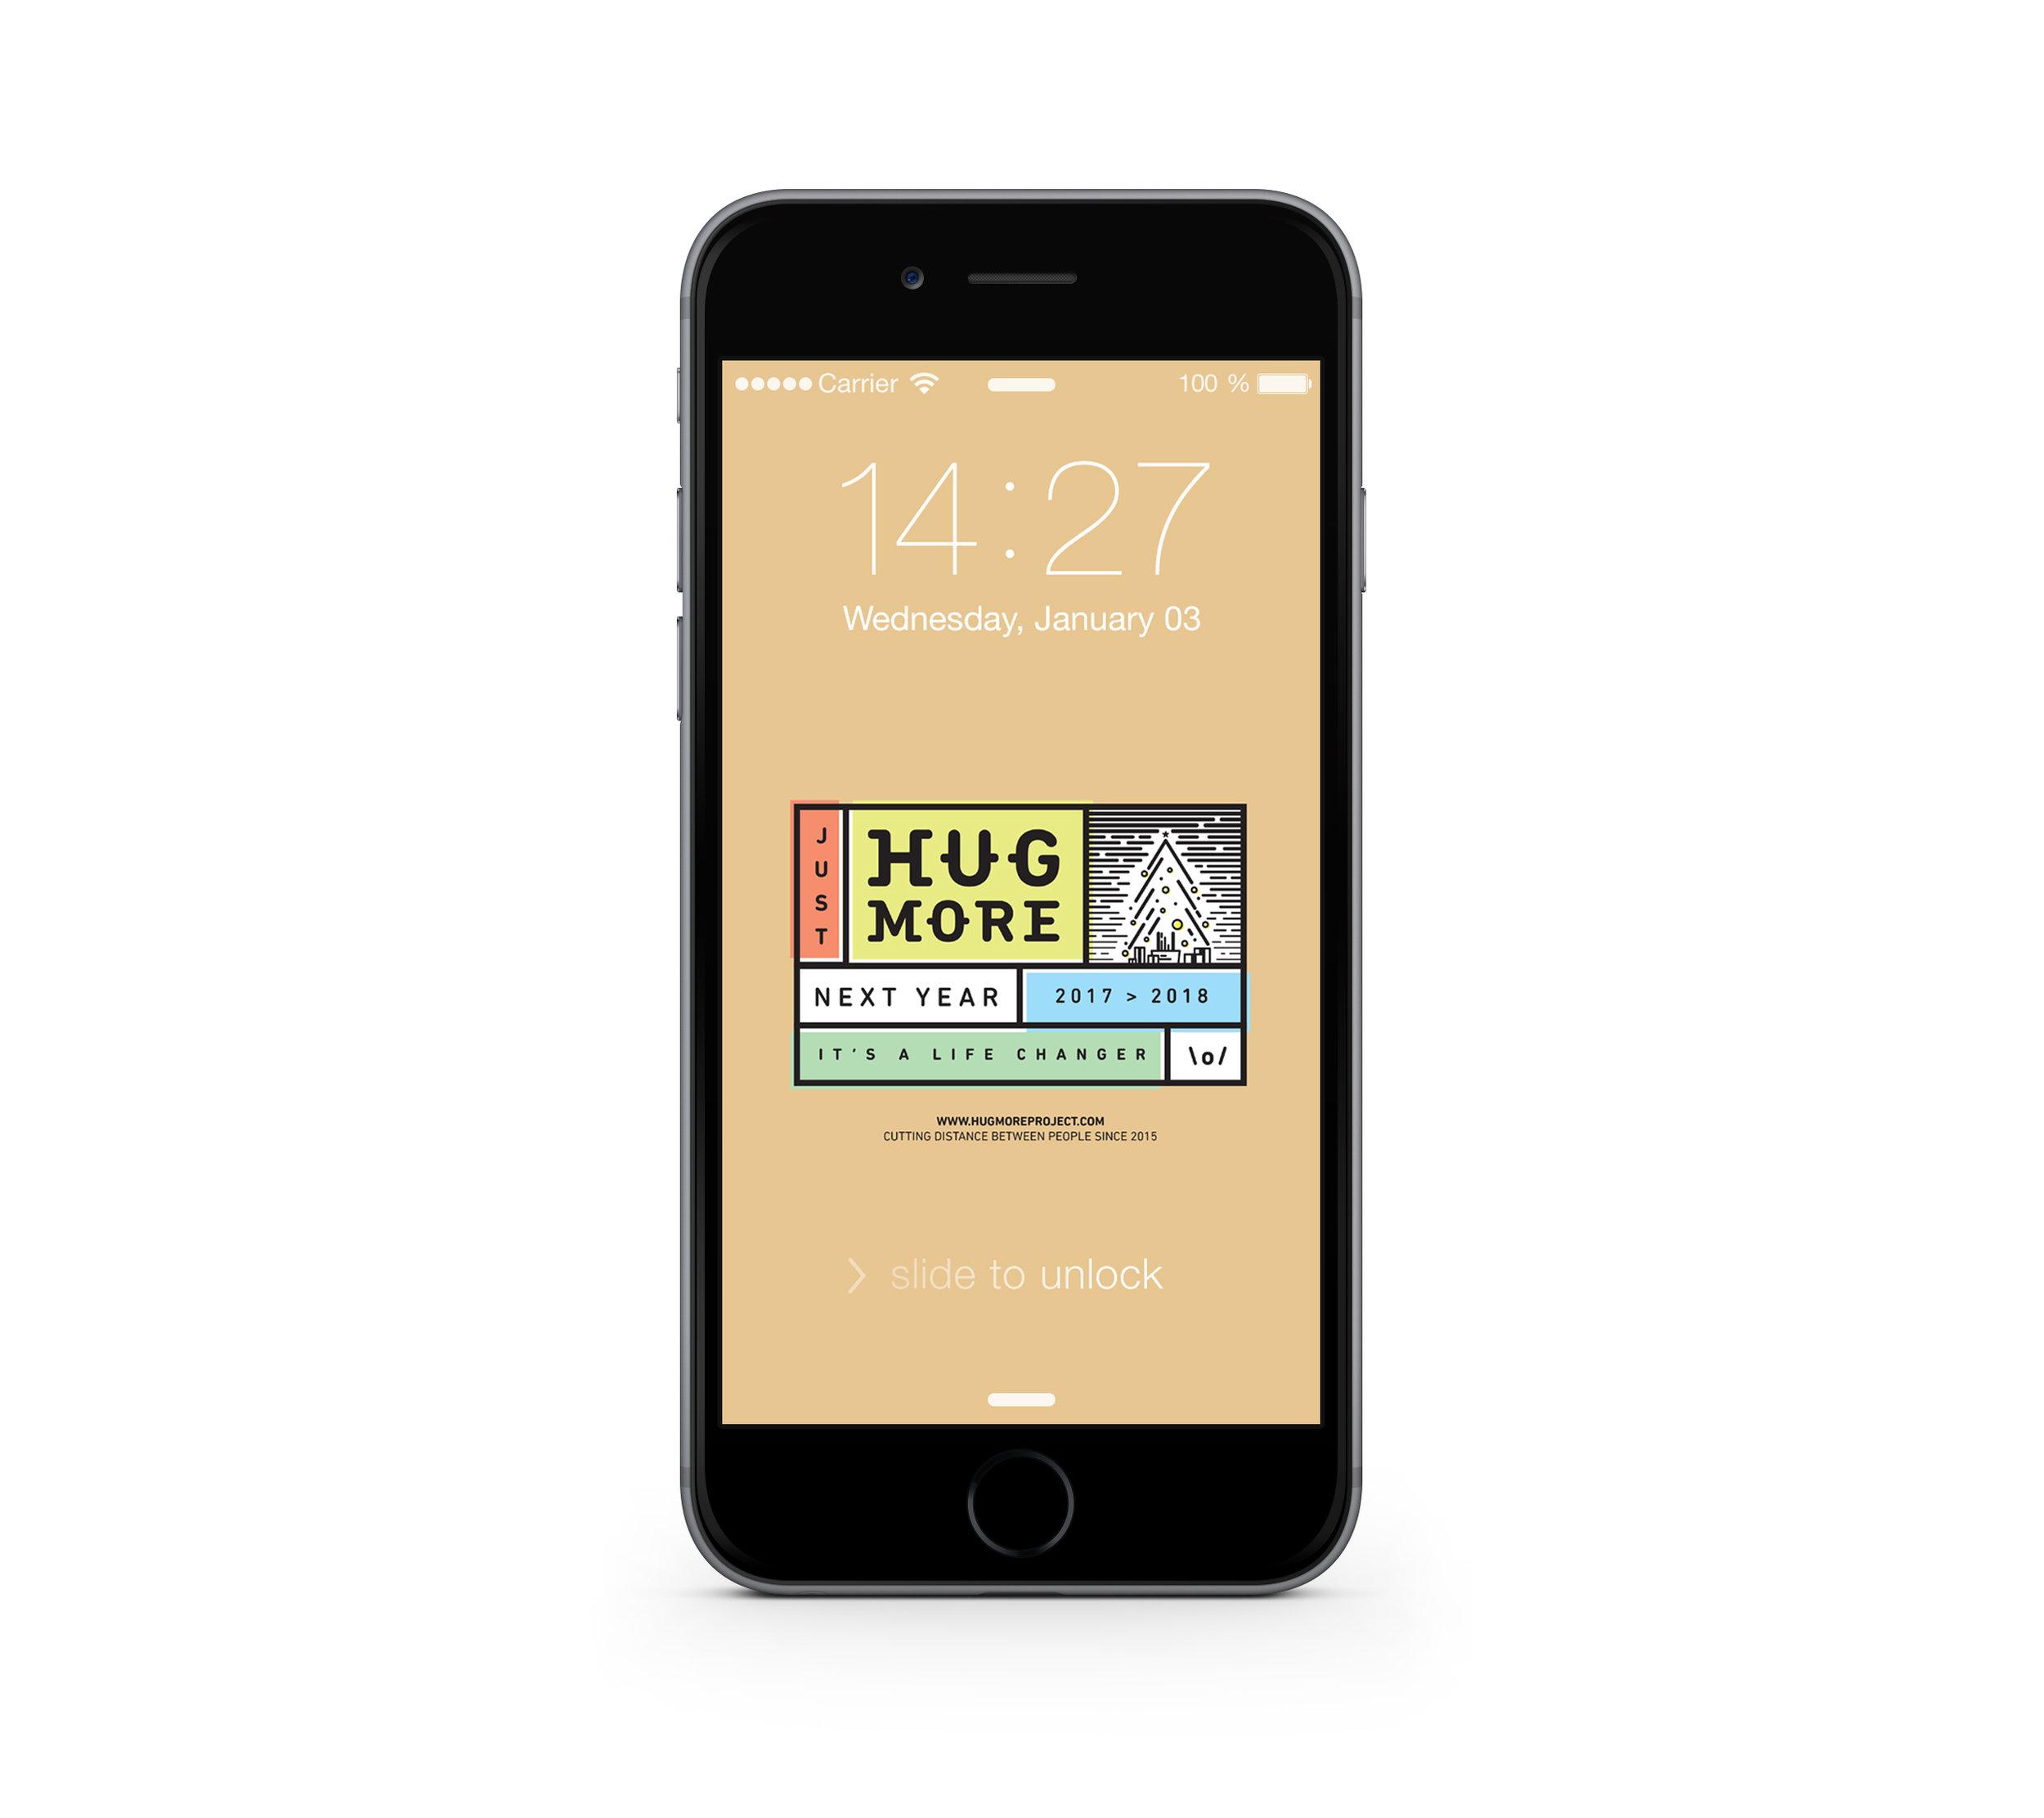 just-hug-more-typo-018-iPhone-mockup-onwhite.jpg